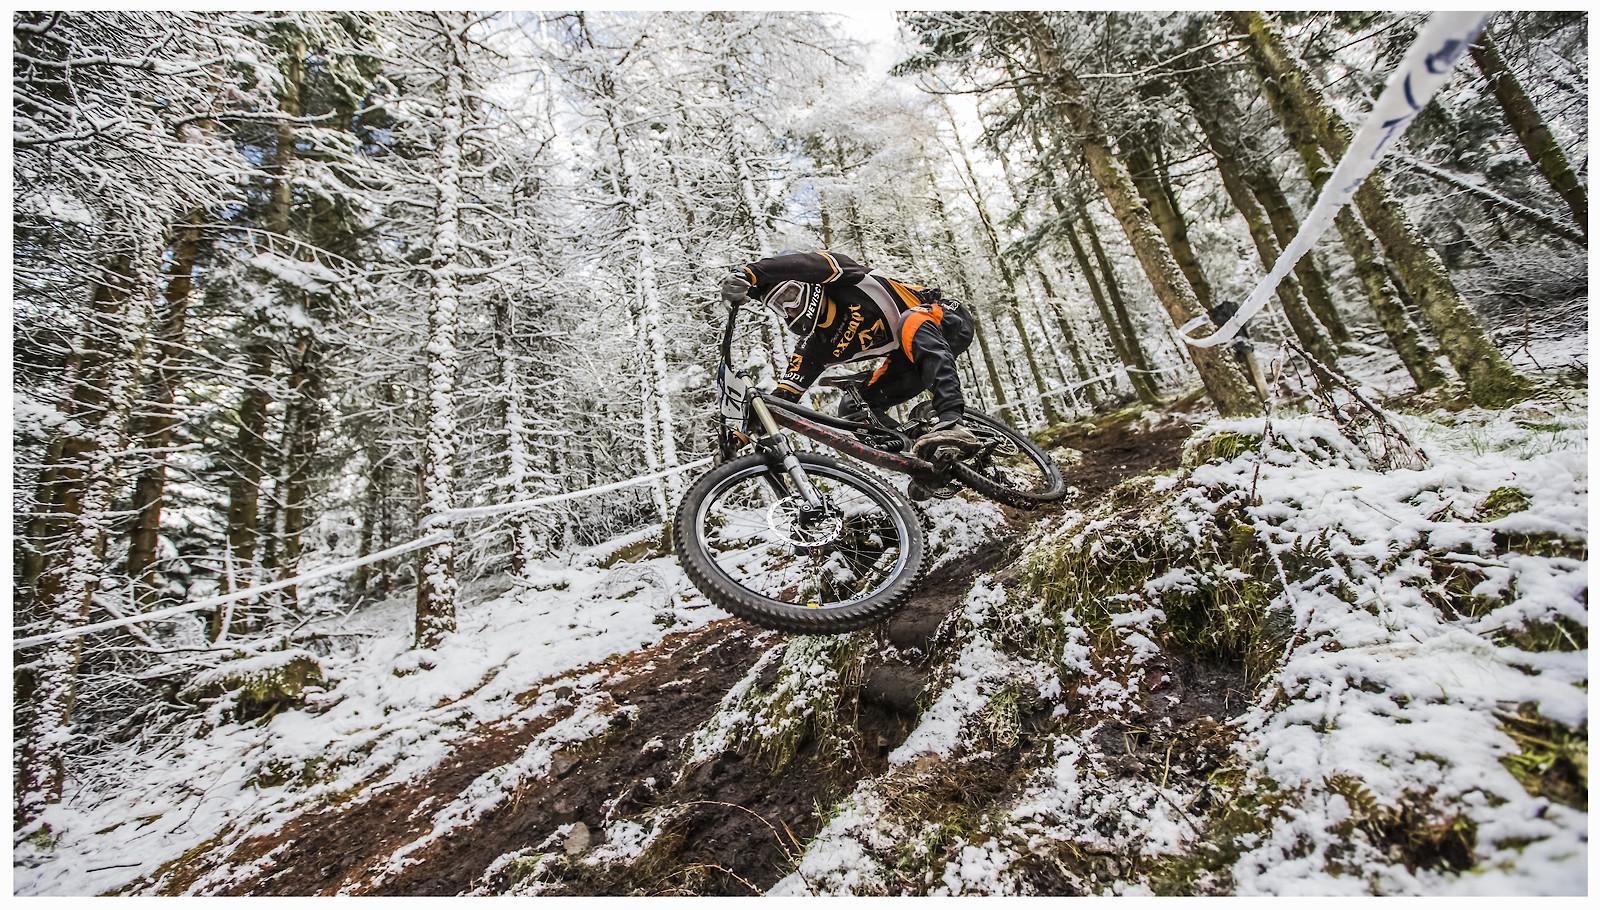 13331634565 9284462204 o - phunkt.com - Mountain Biking Pictures - Vital MTB